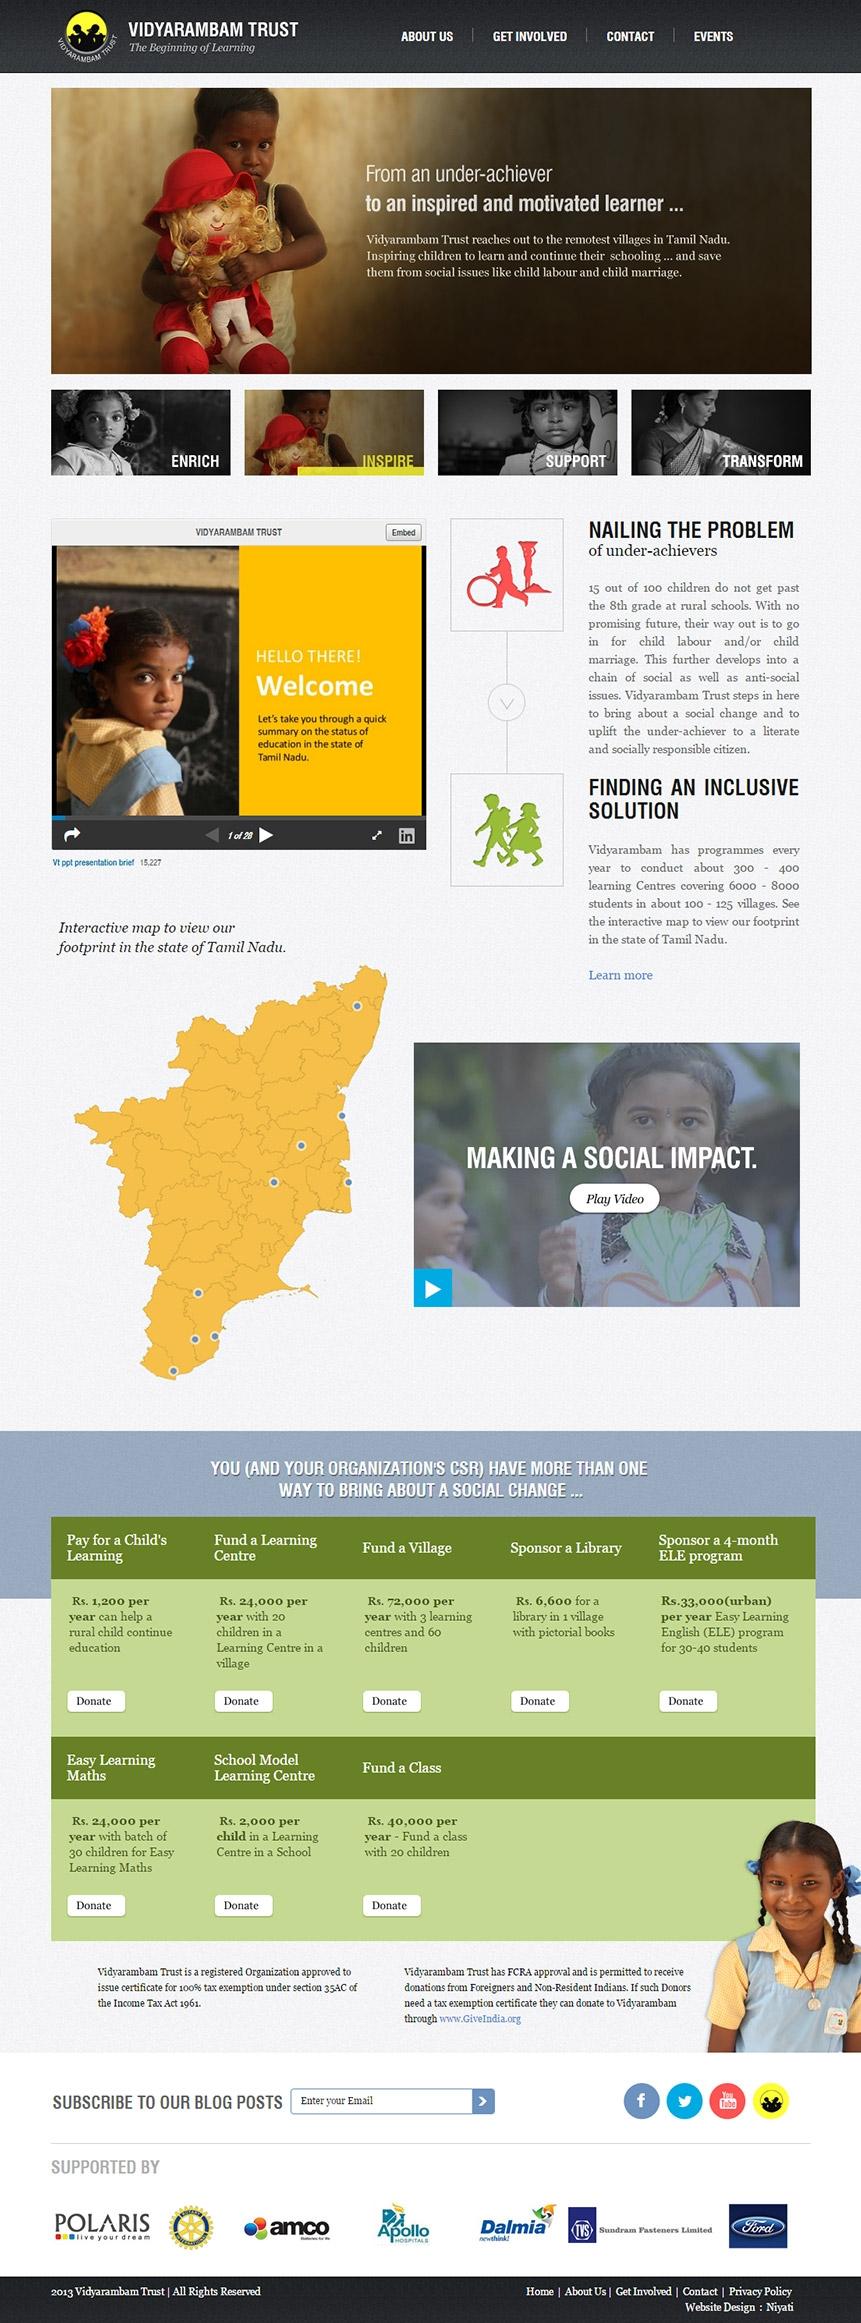 Educational trust website design